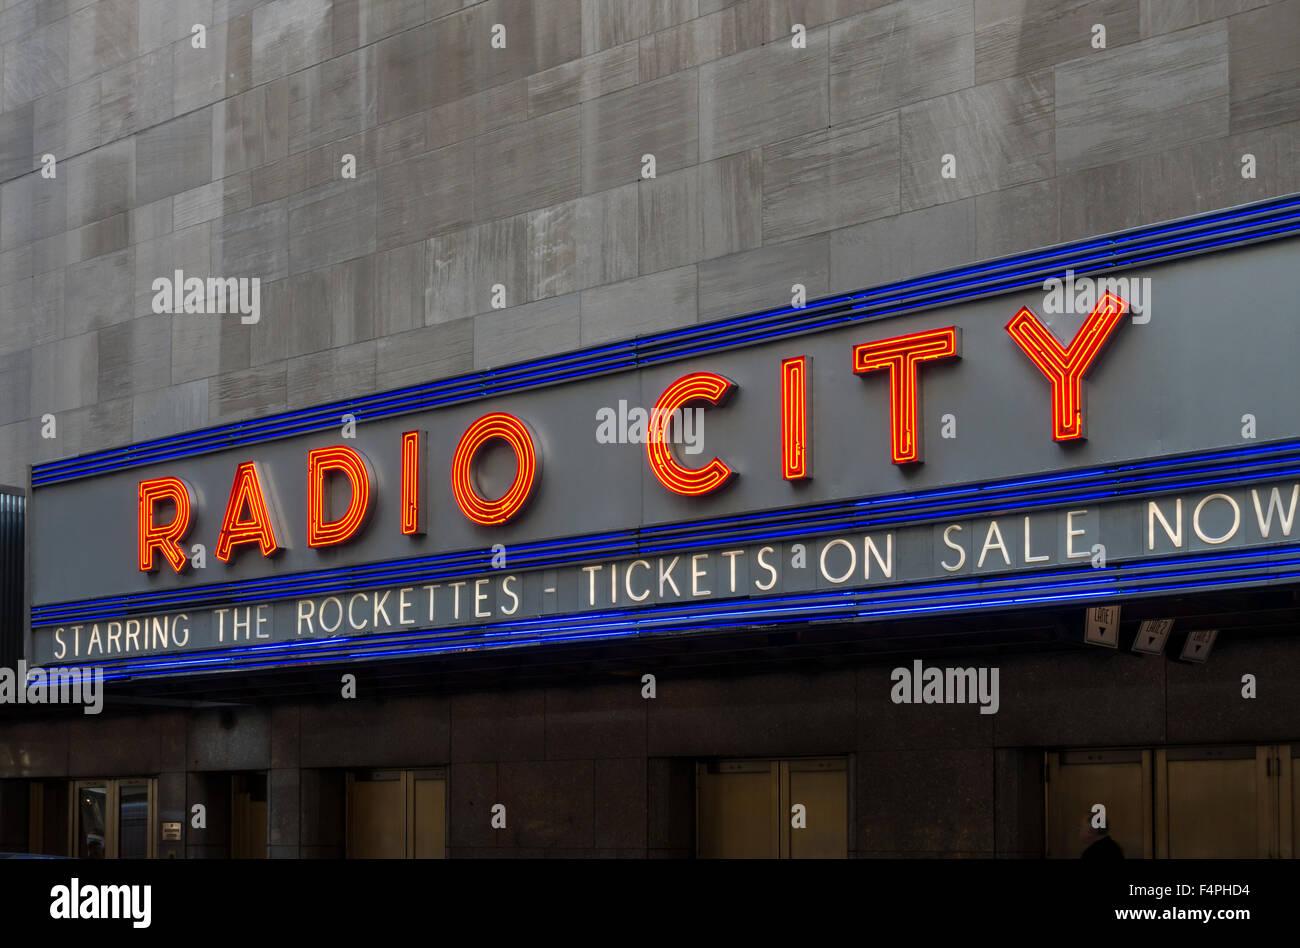 Radio City music hall in Midtown Manhattan, New York City - Stock Image